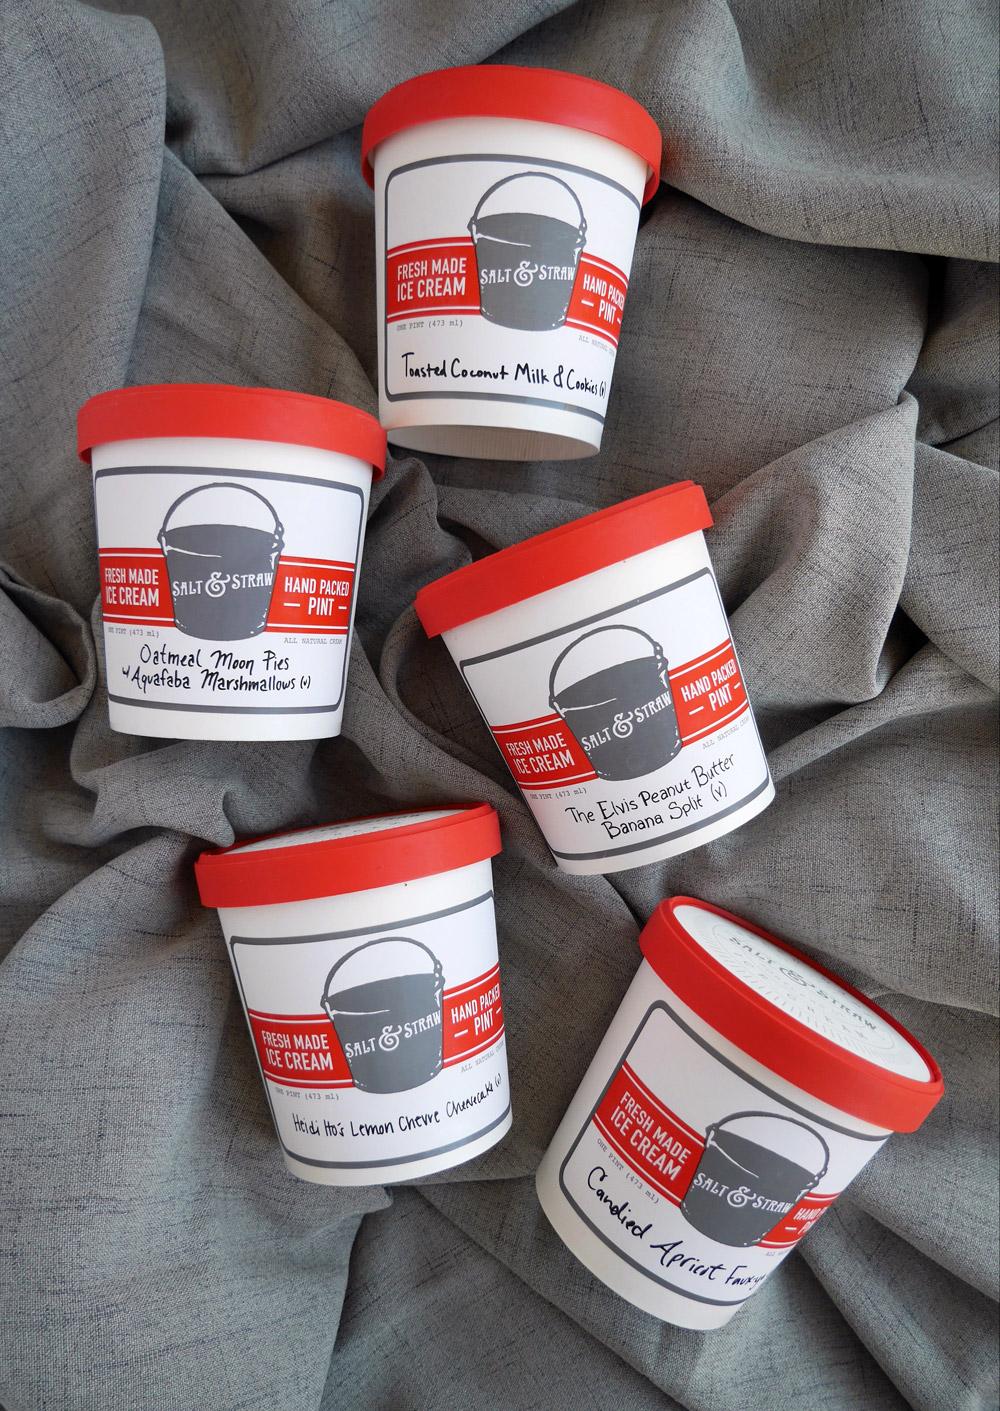 Salt & Straw - Vegan Ice Cream From Portland, Oregon